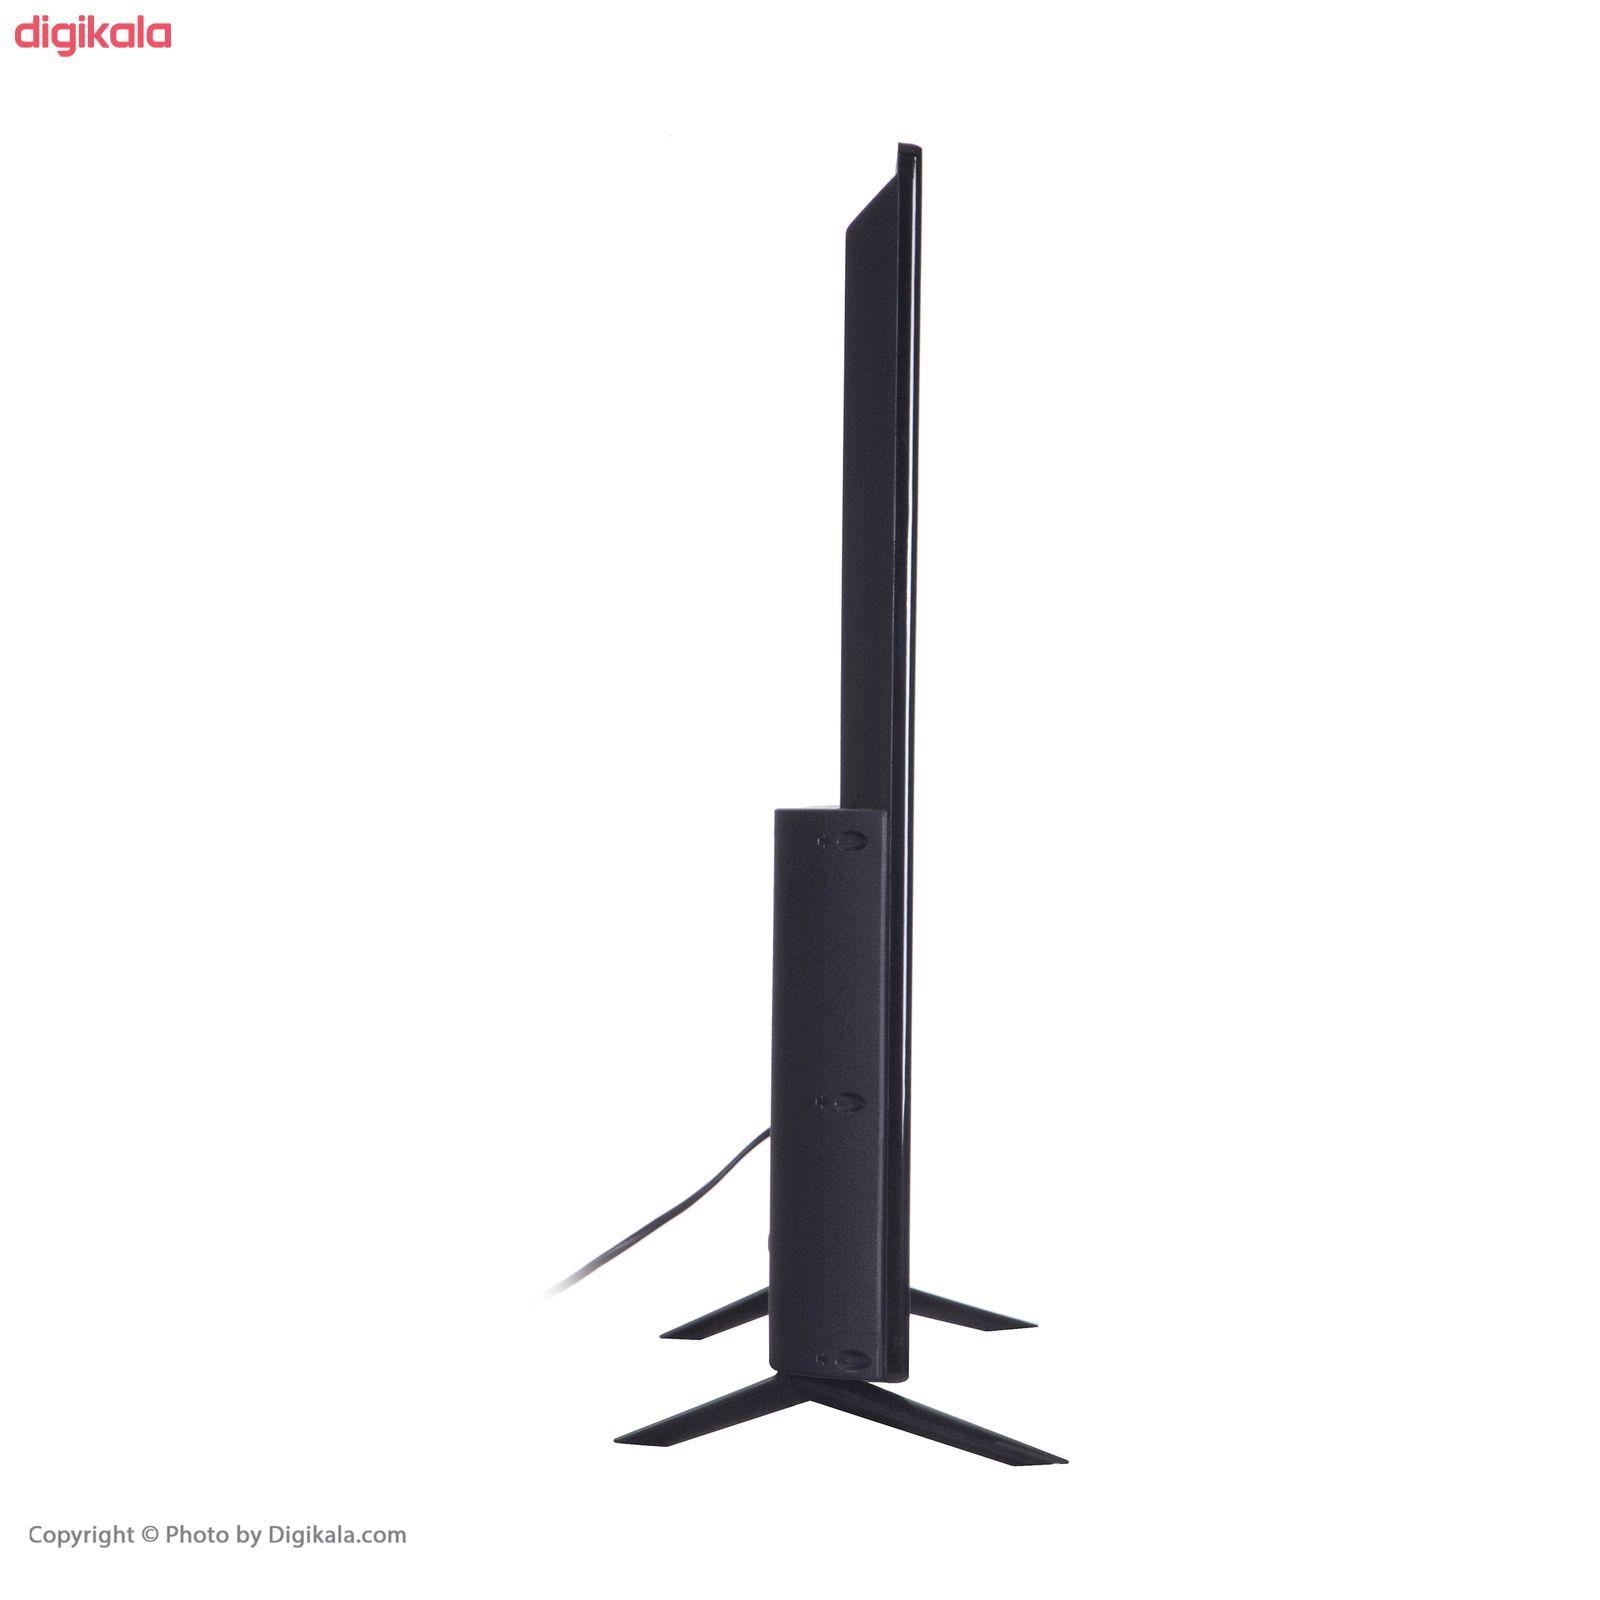 تلویزیون ال ای دی هوشمند سام الکترونیک مدل UA43T5500TH سایز ۴۳ اینچ main 1 4